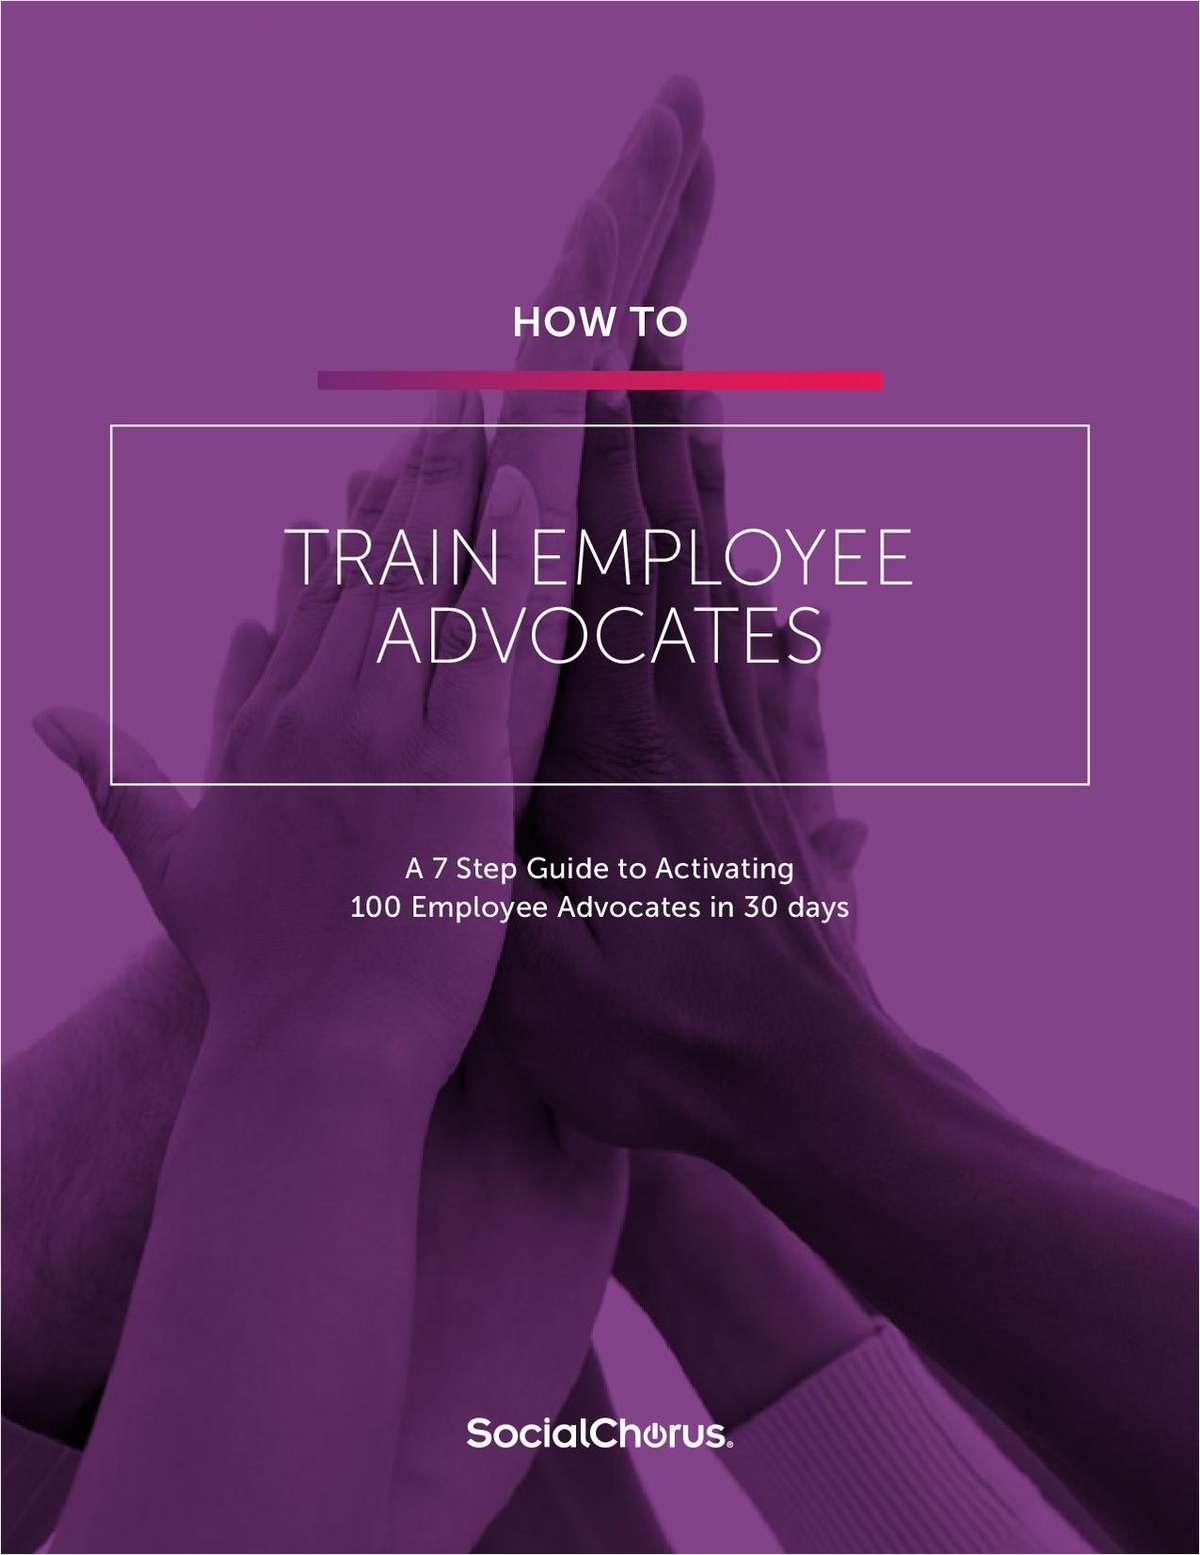 How to Train Employee Advocates